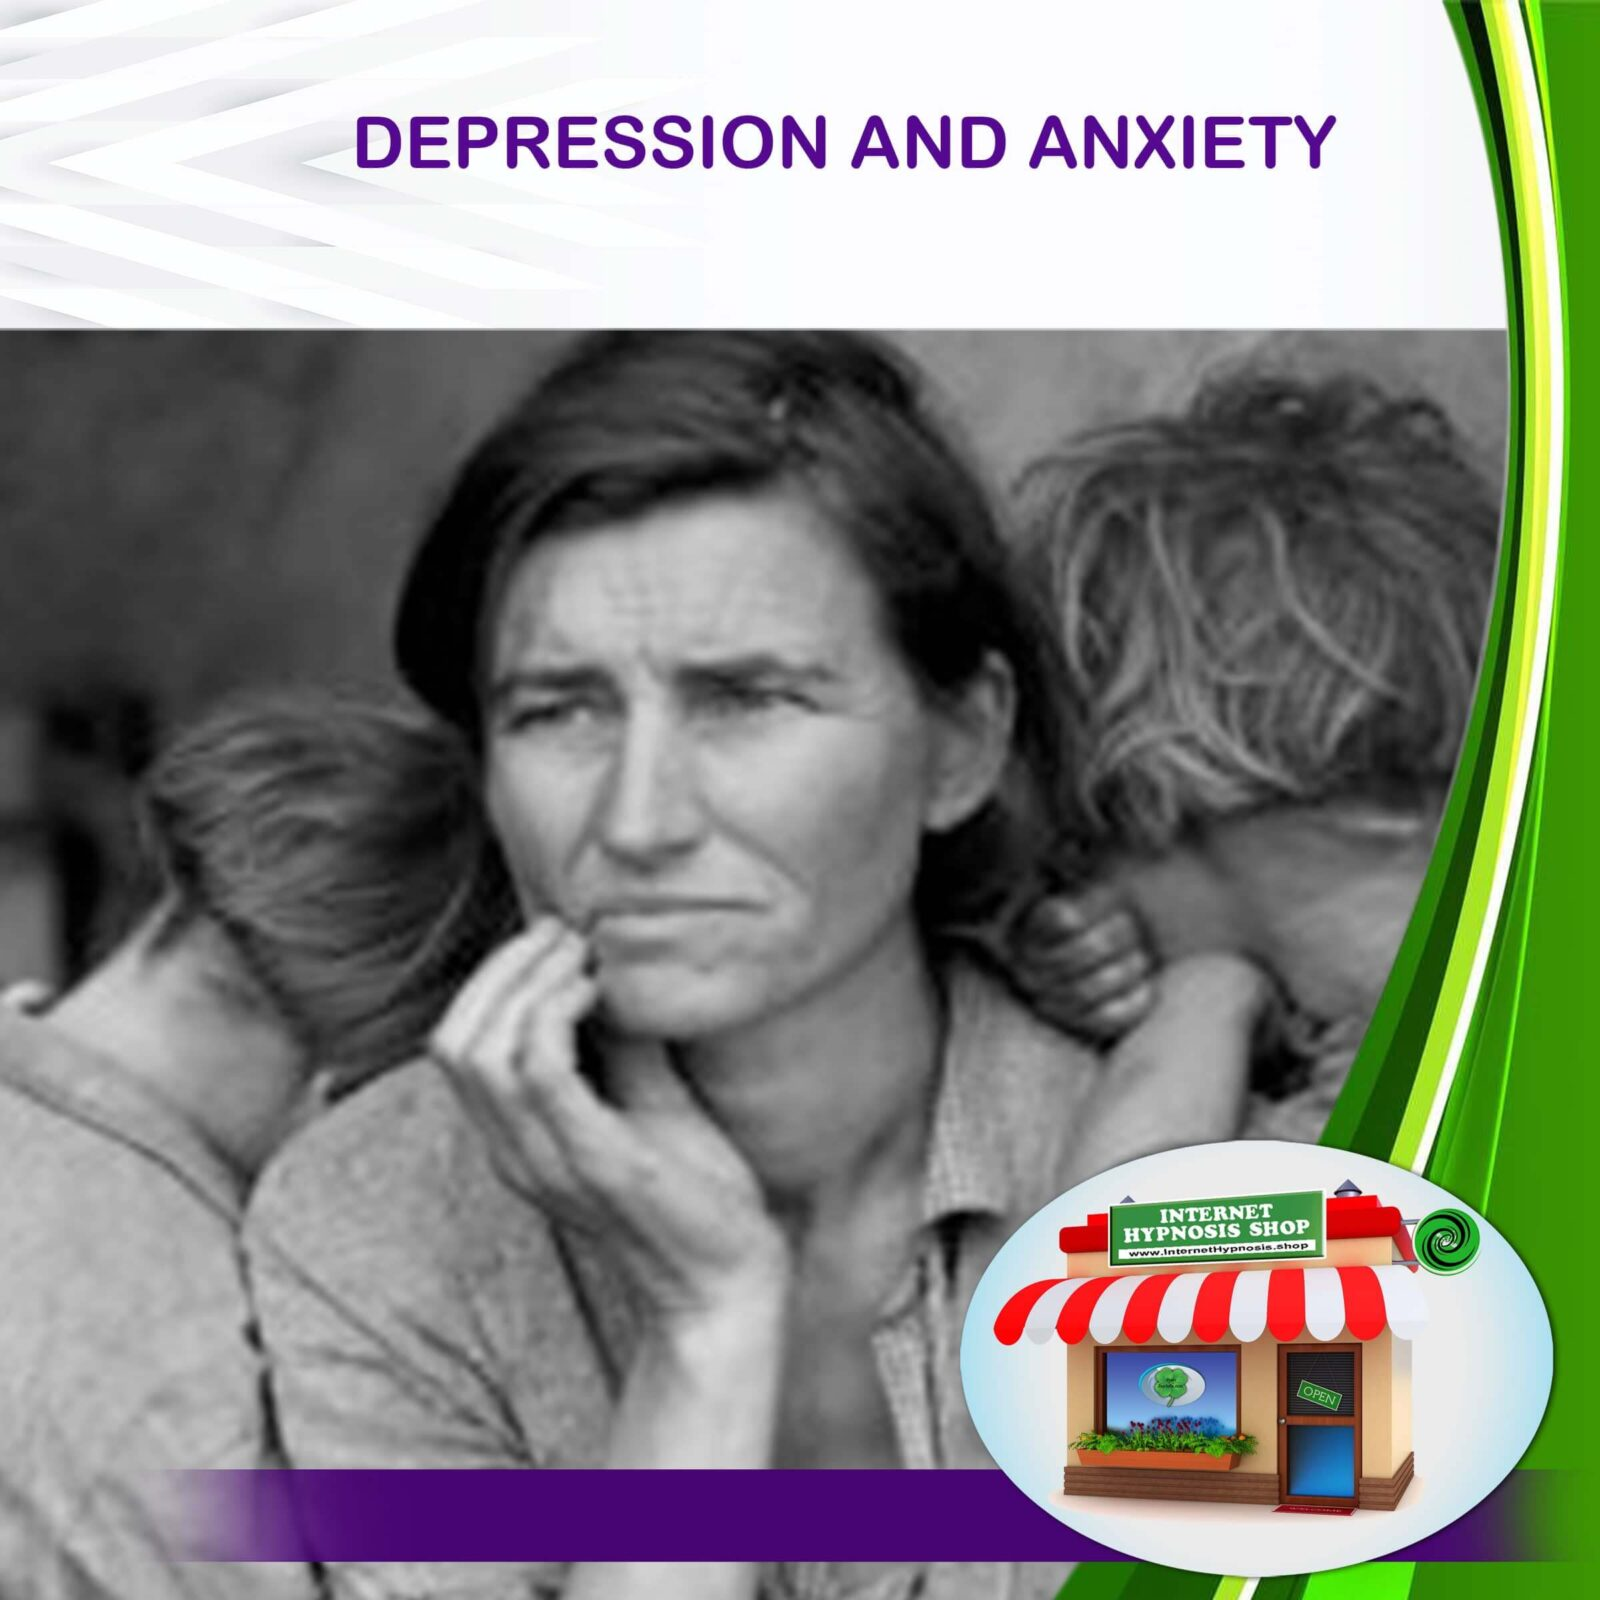 DEPRESSION AND ANXIETY. minjpg